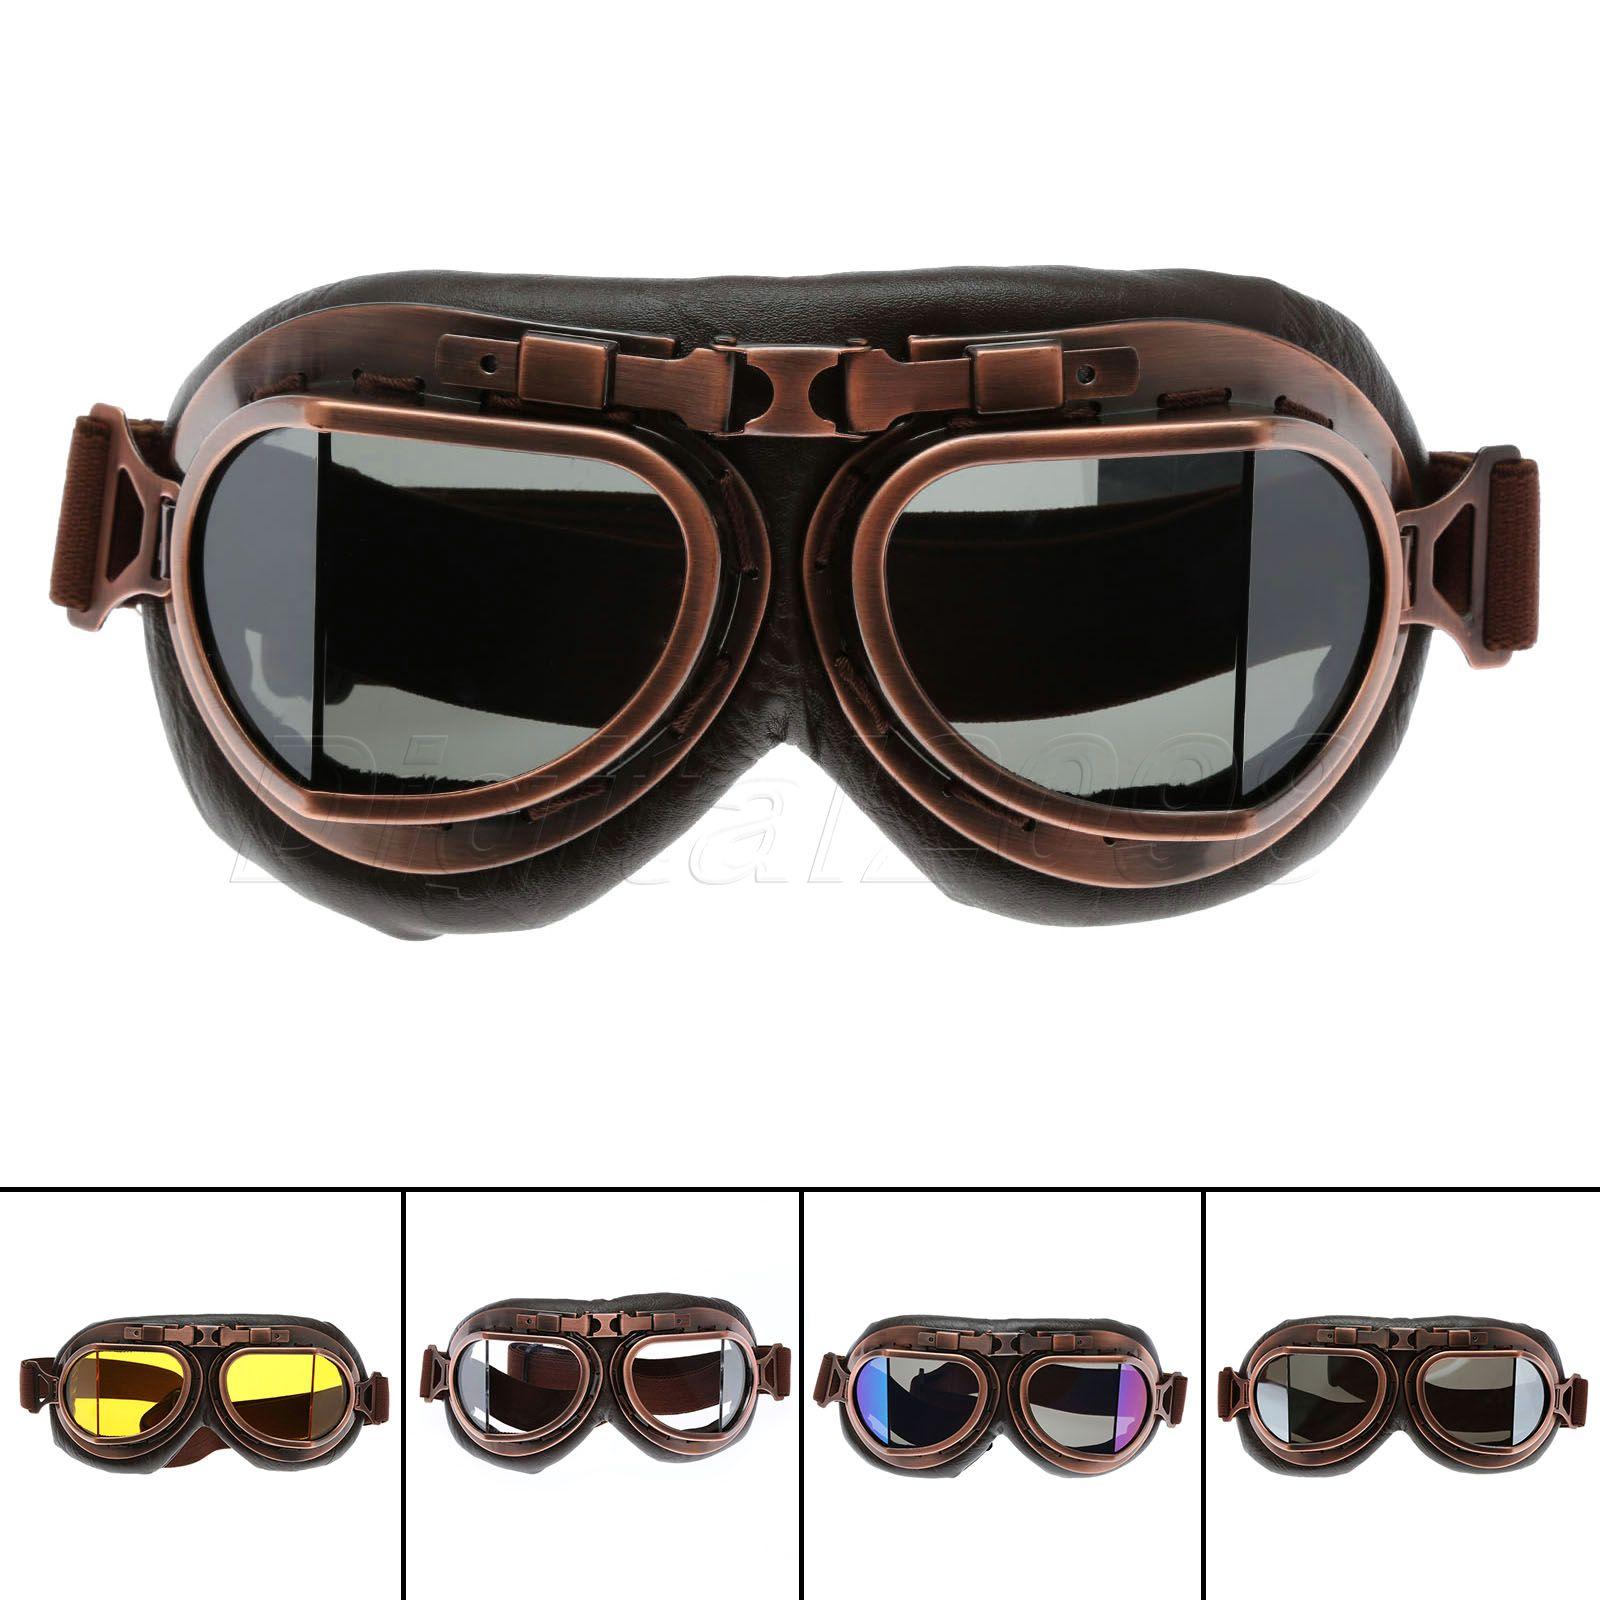 Yetaha WWII RAF Vintage Motorcycle Goggles Harley Motocross Aviator Pilot Cruiser Glasses ATV Dirt Bike Motor Helmet 5 Colors